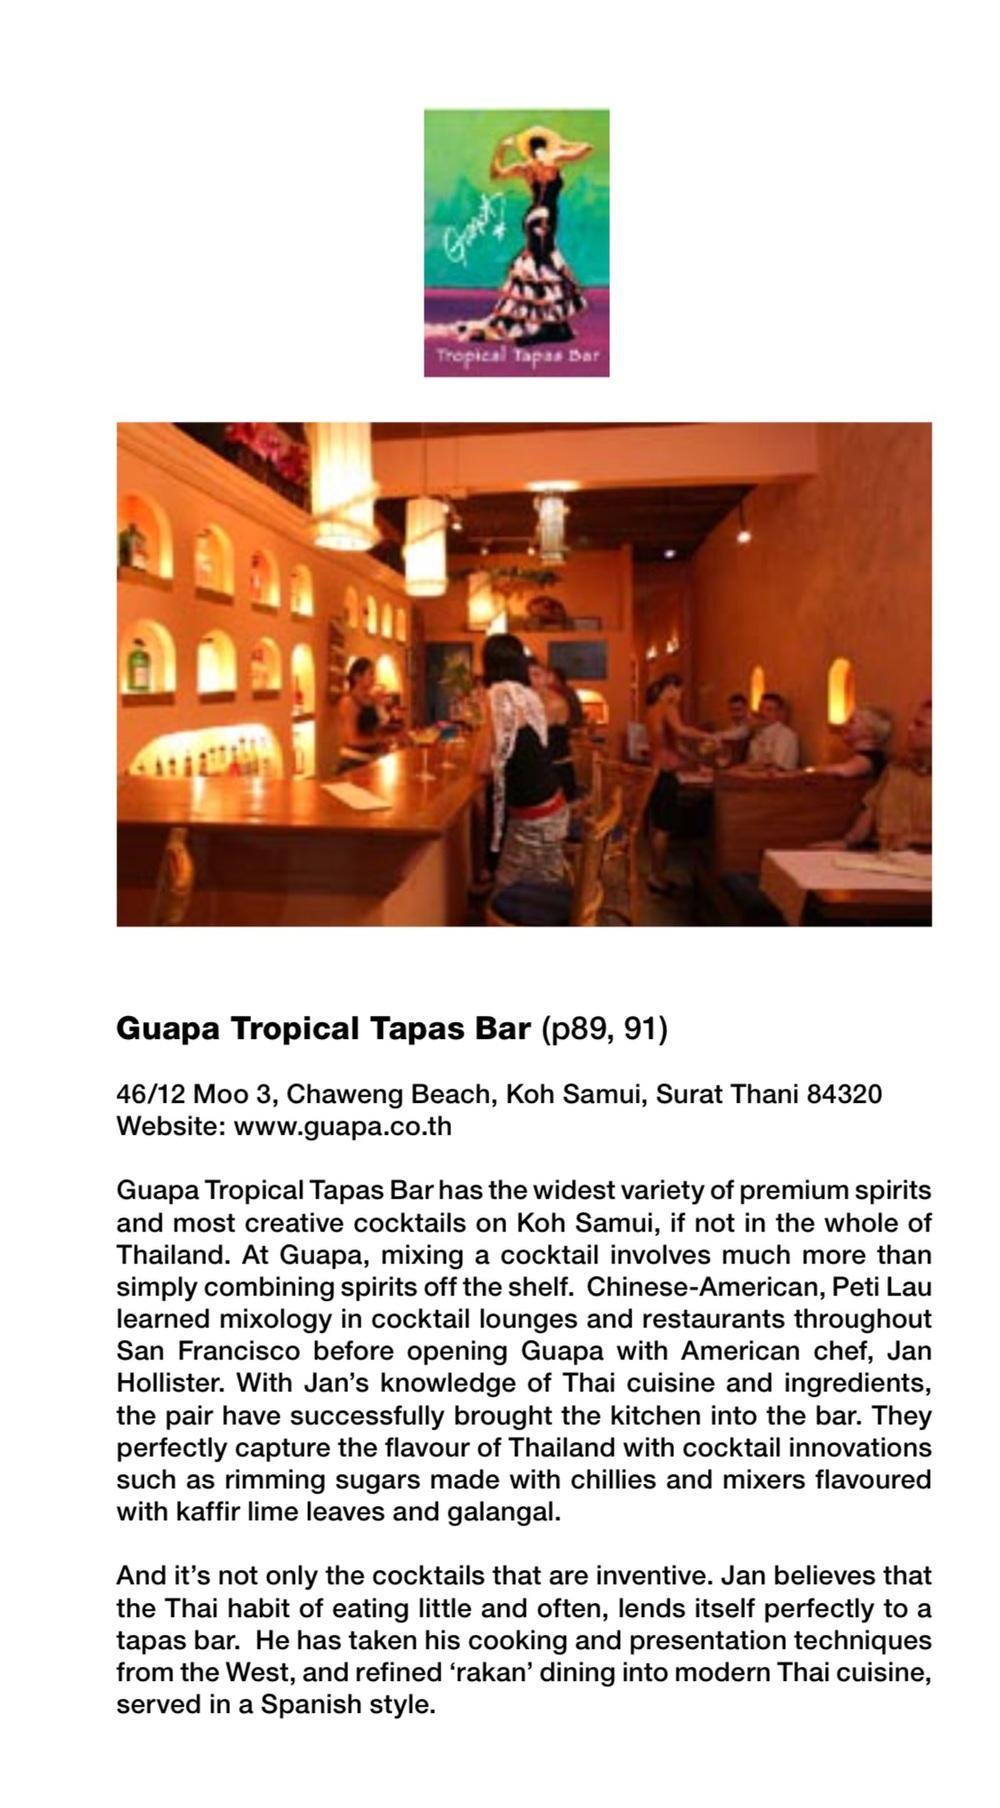 Guapa Tropical Tapas Bar.jpg